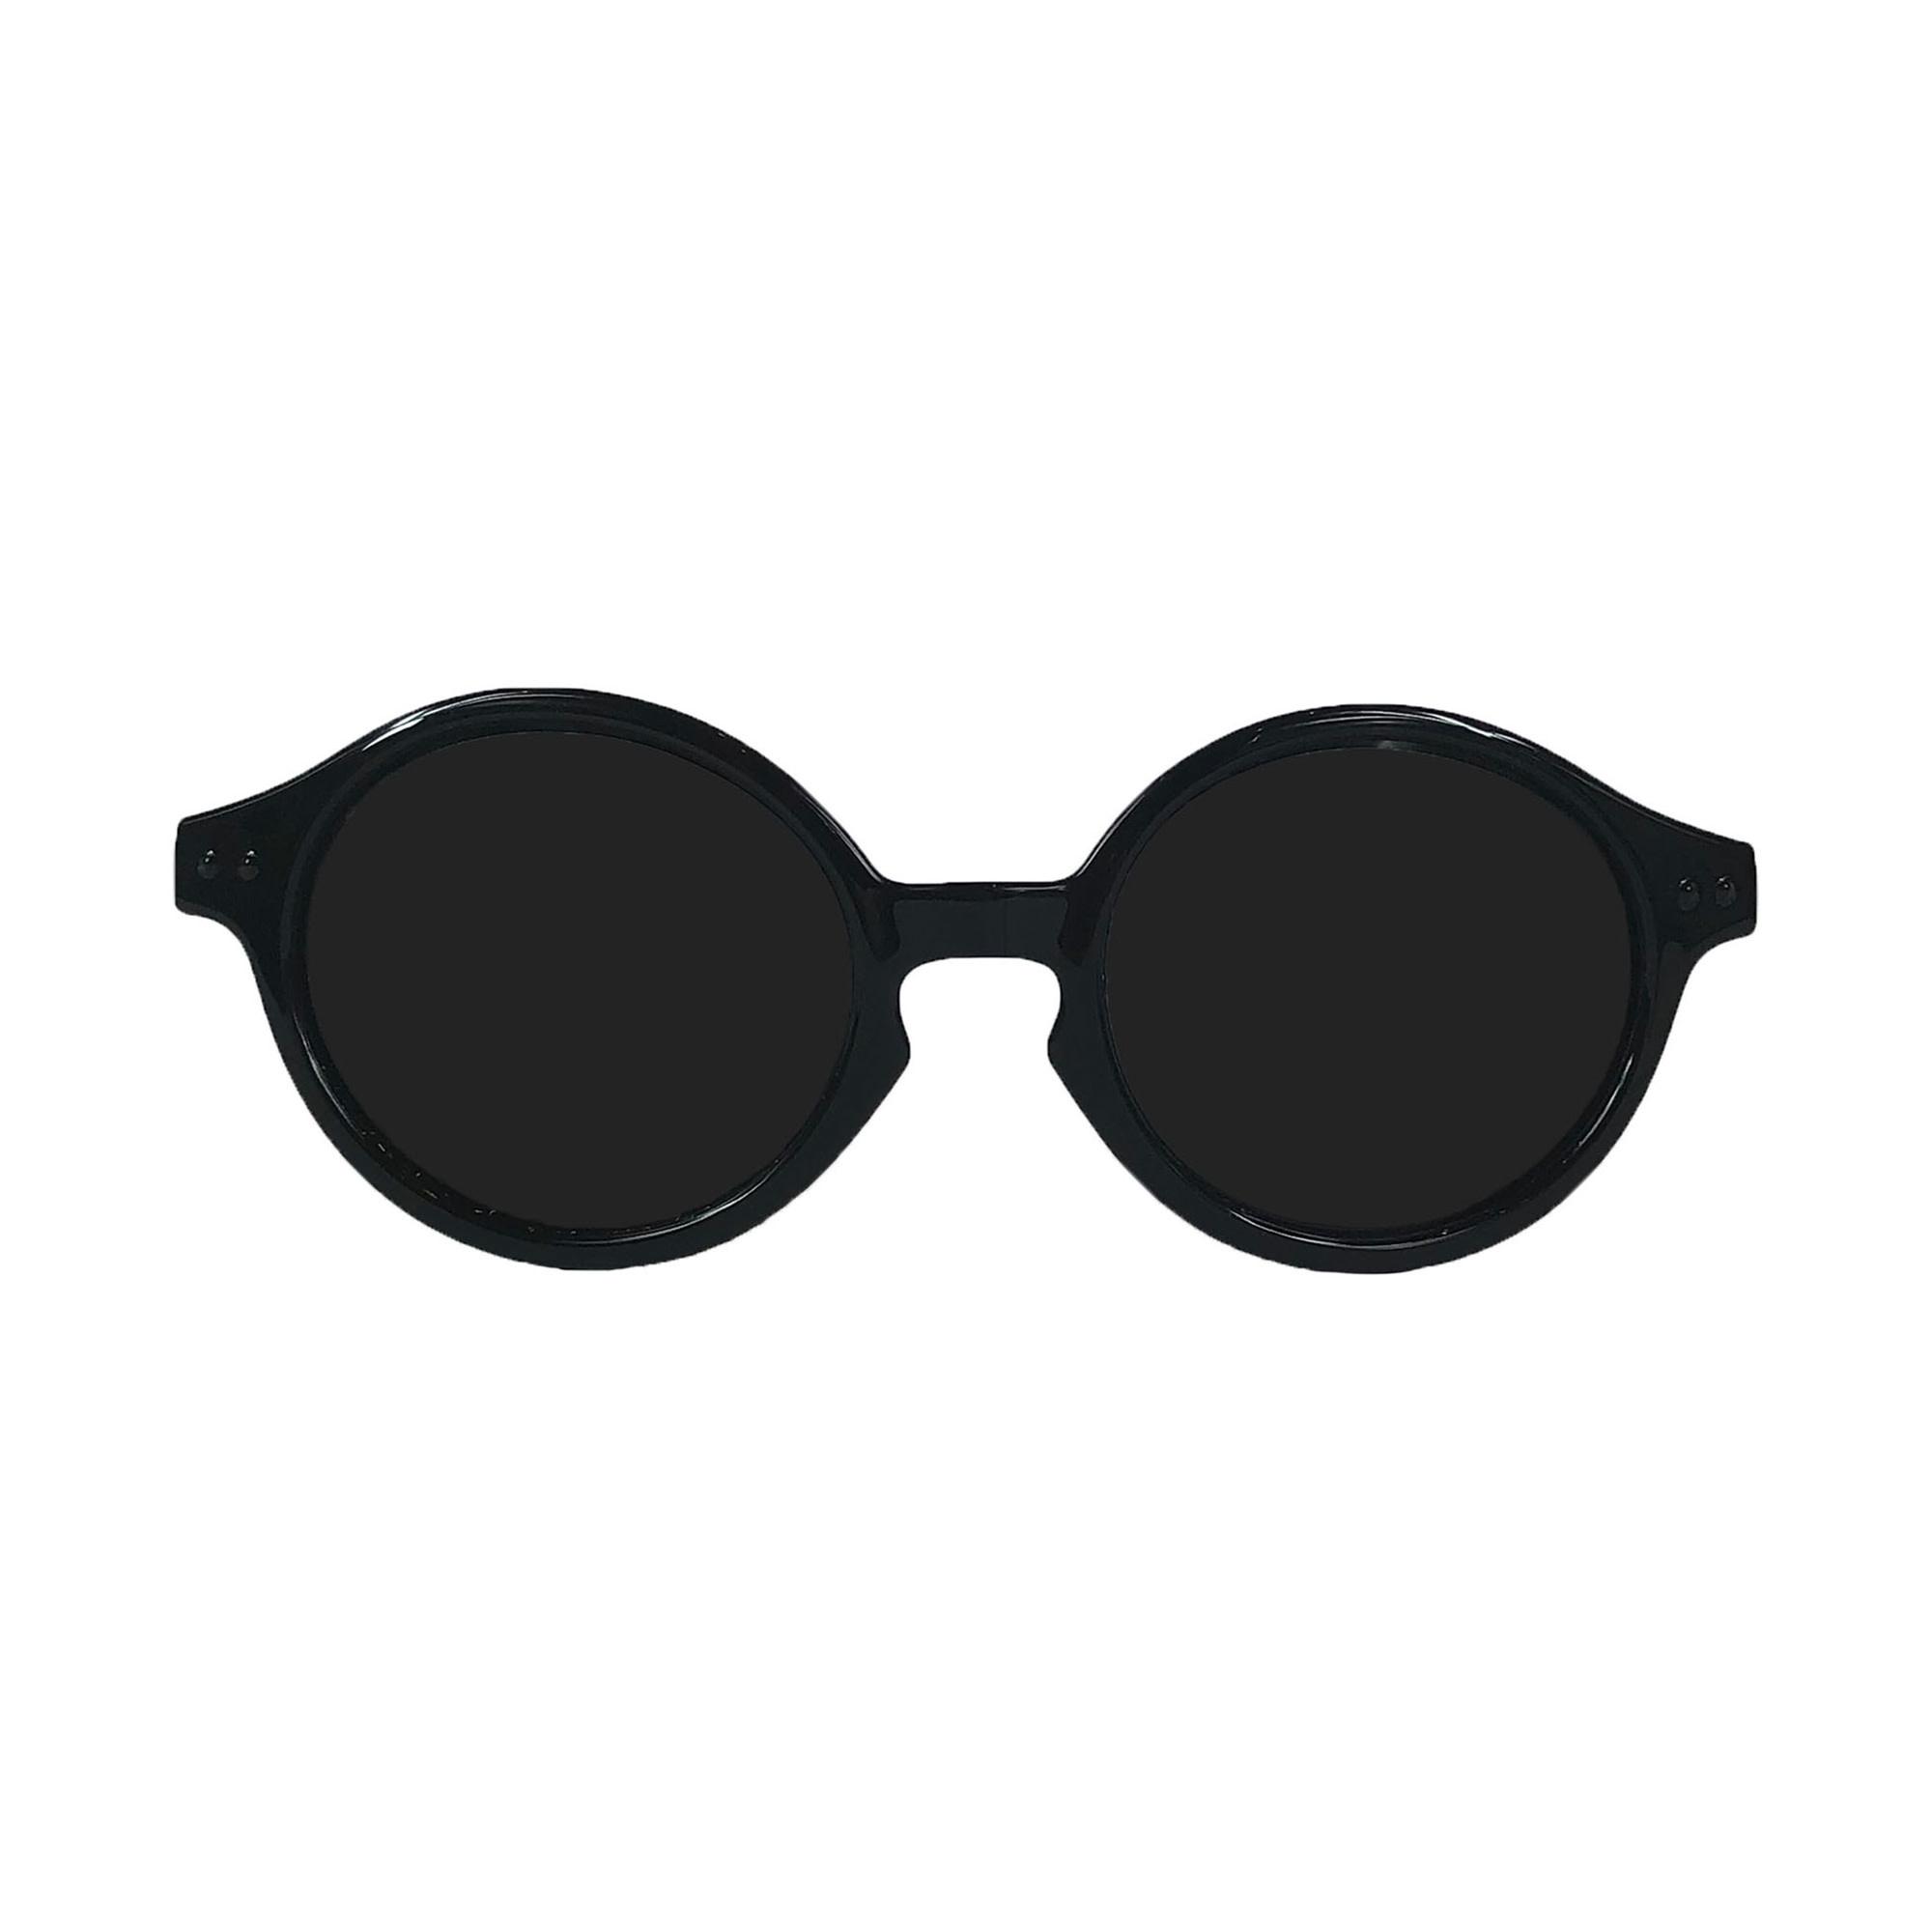 Babyfied Apparel Black Rounds Sunglasses 2-24mos